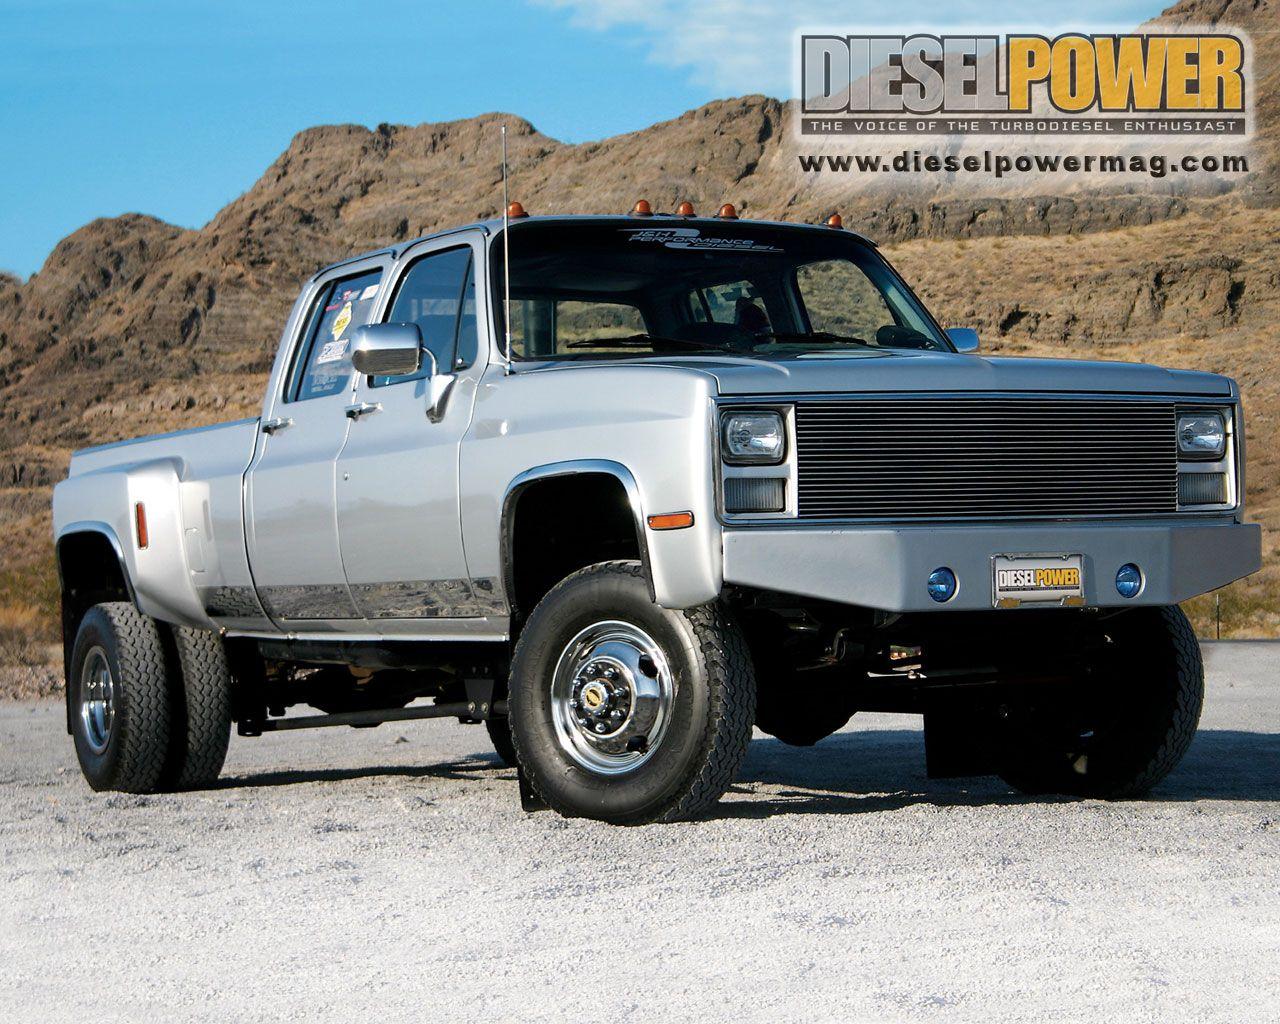 medium resolution of 1980 chevy silverado dually 4x4 6 6l duramax diesel 6 speed manual trans 31 to 33 tires